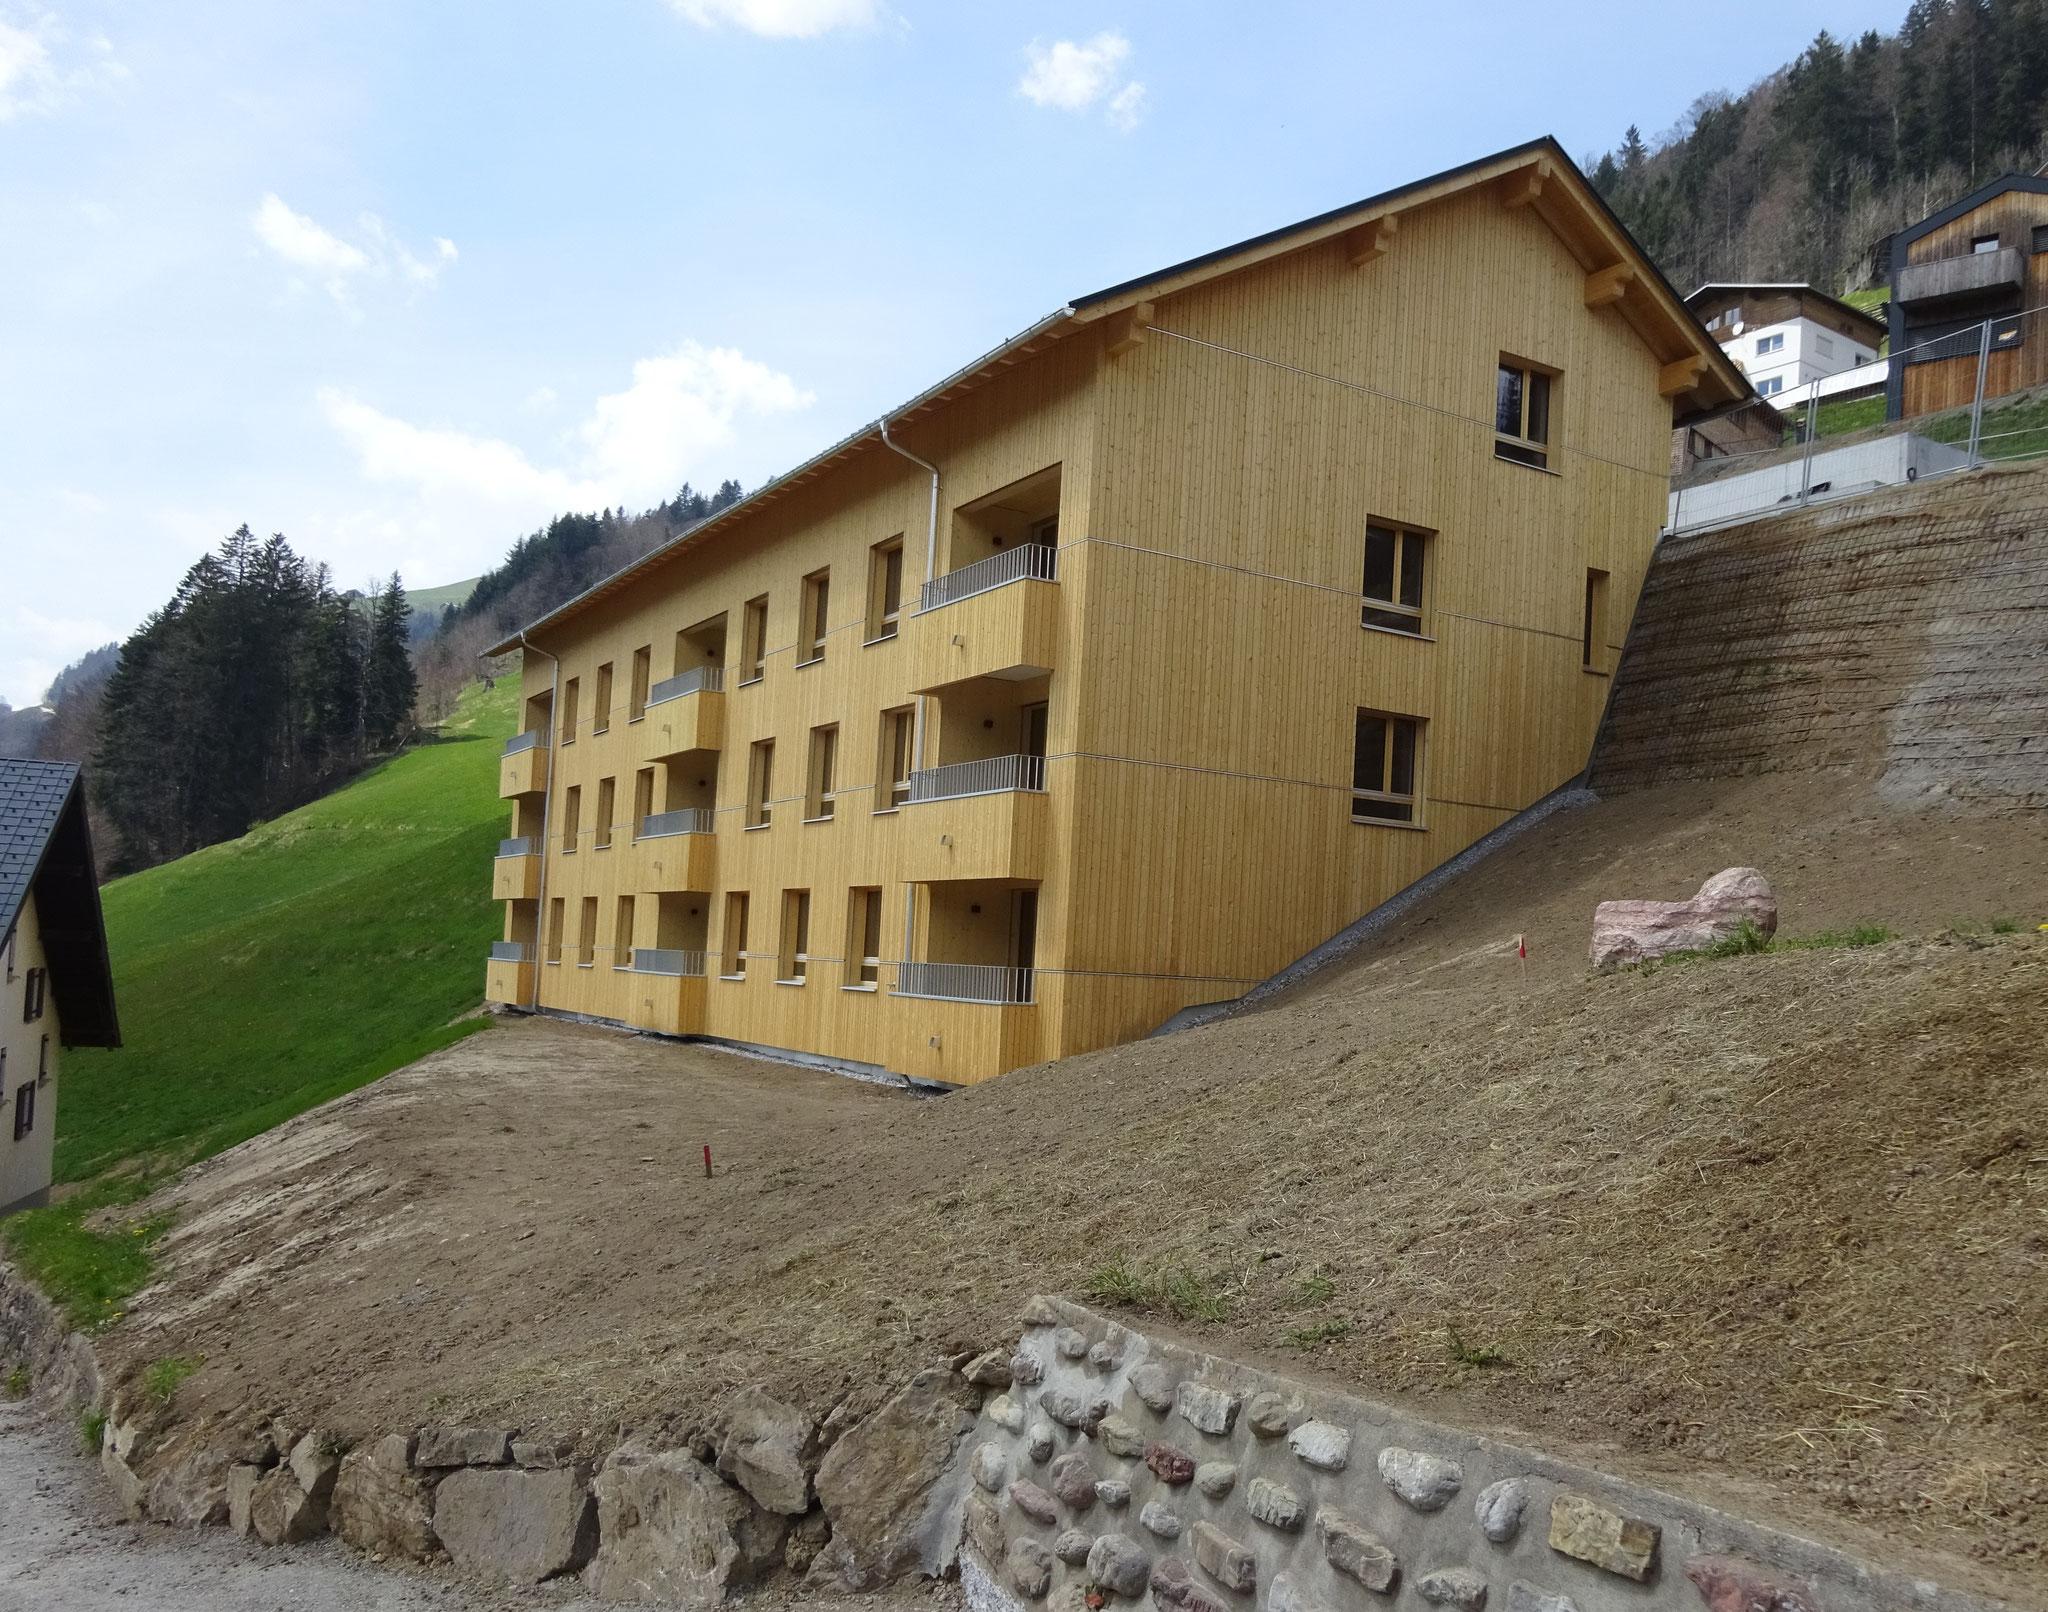 WA Bühl Sonntag, Bauherr: Wohnbauselbsthilfe Vorarlberg